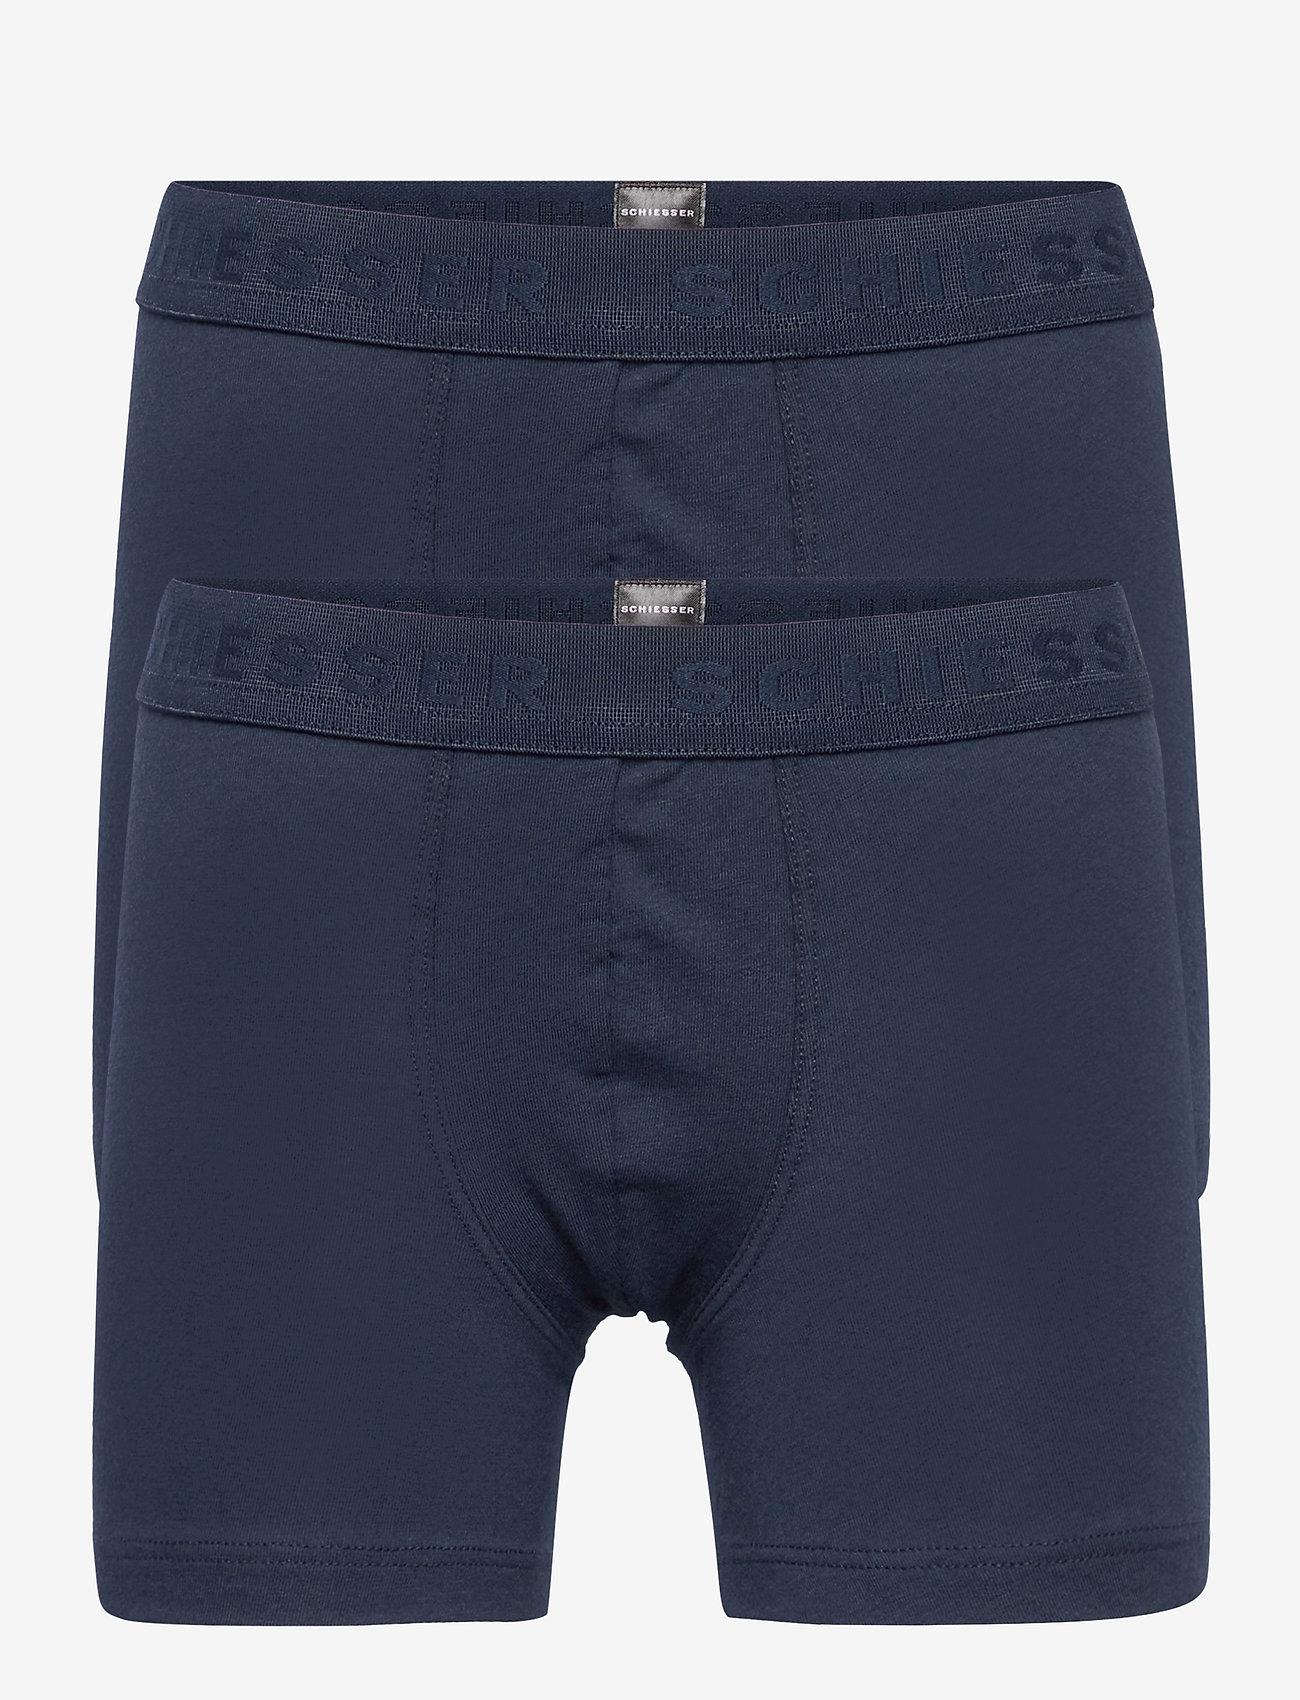 Schiesser - Shorts - shorts - nightblue - 0